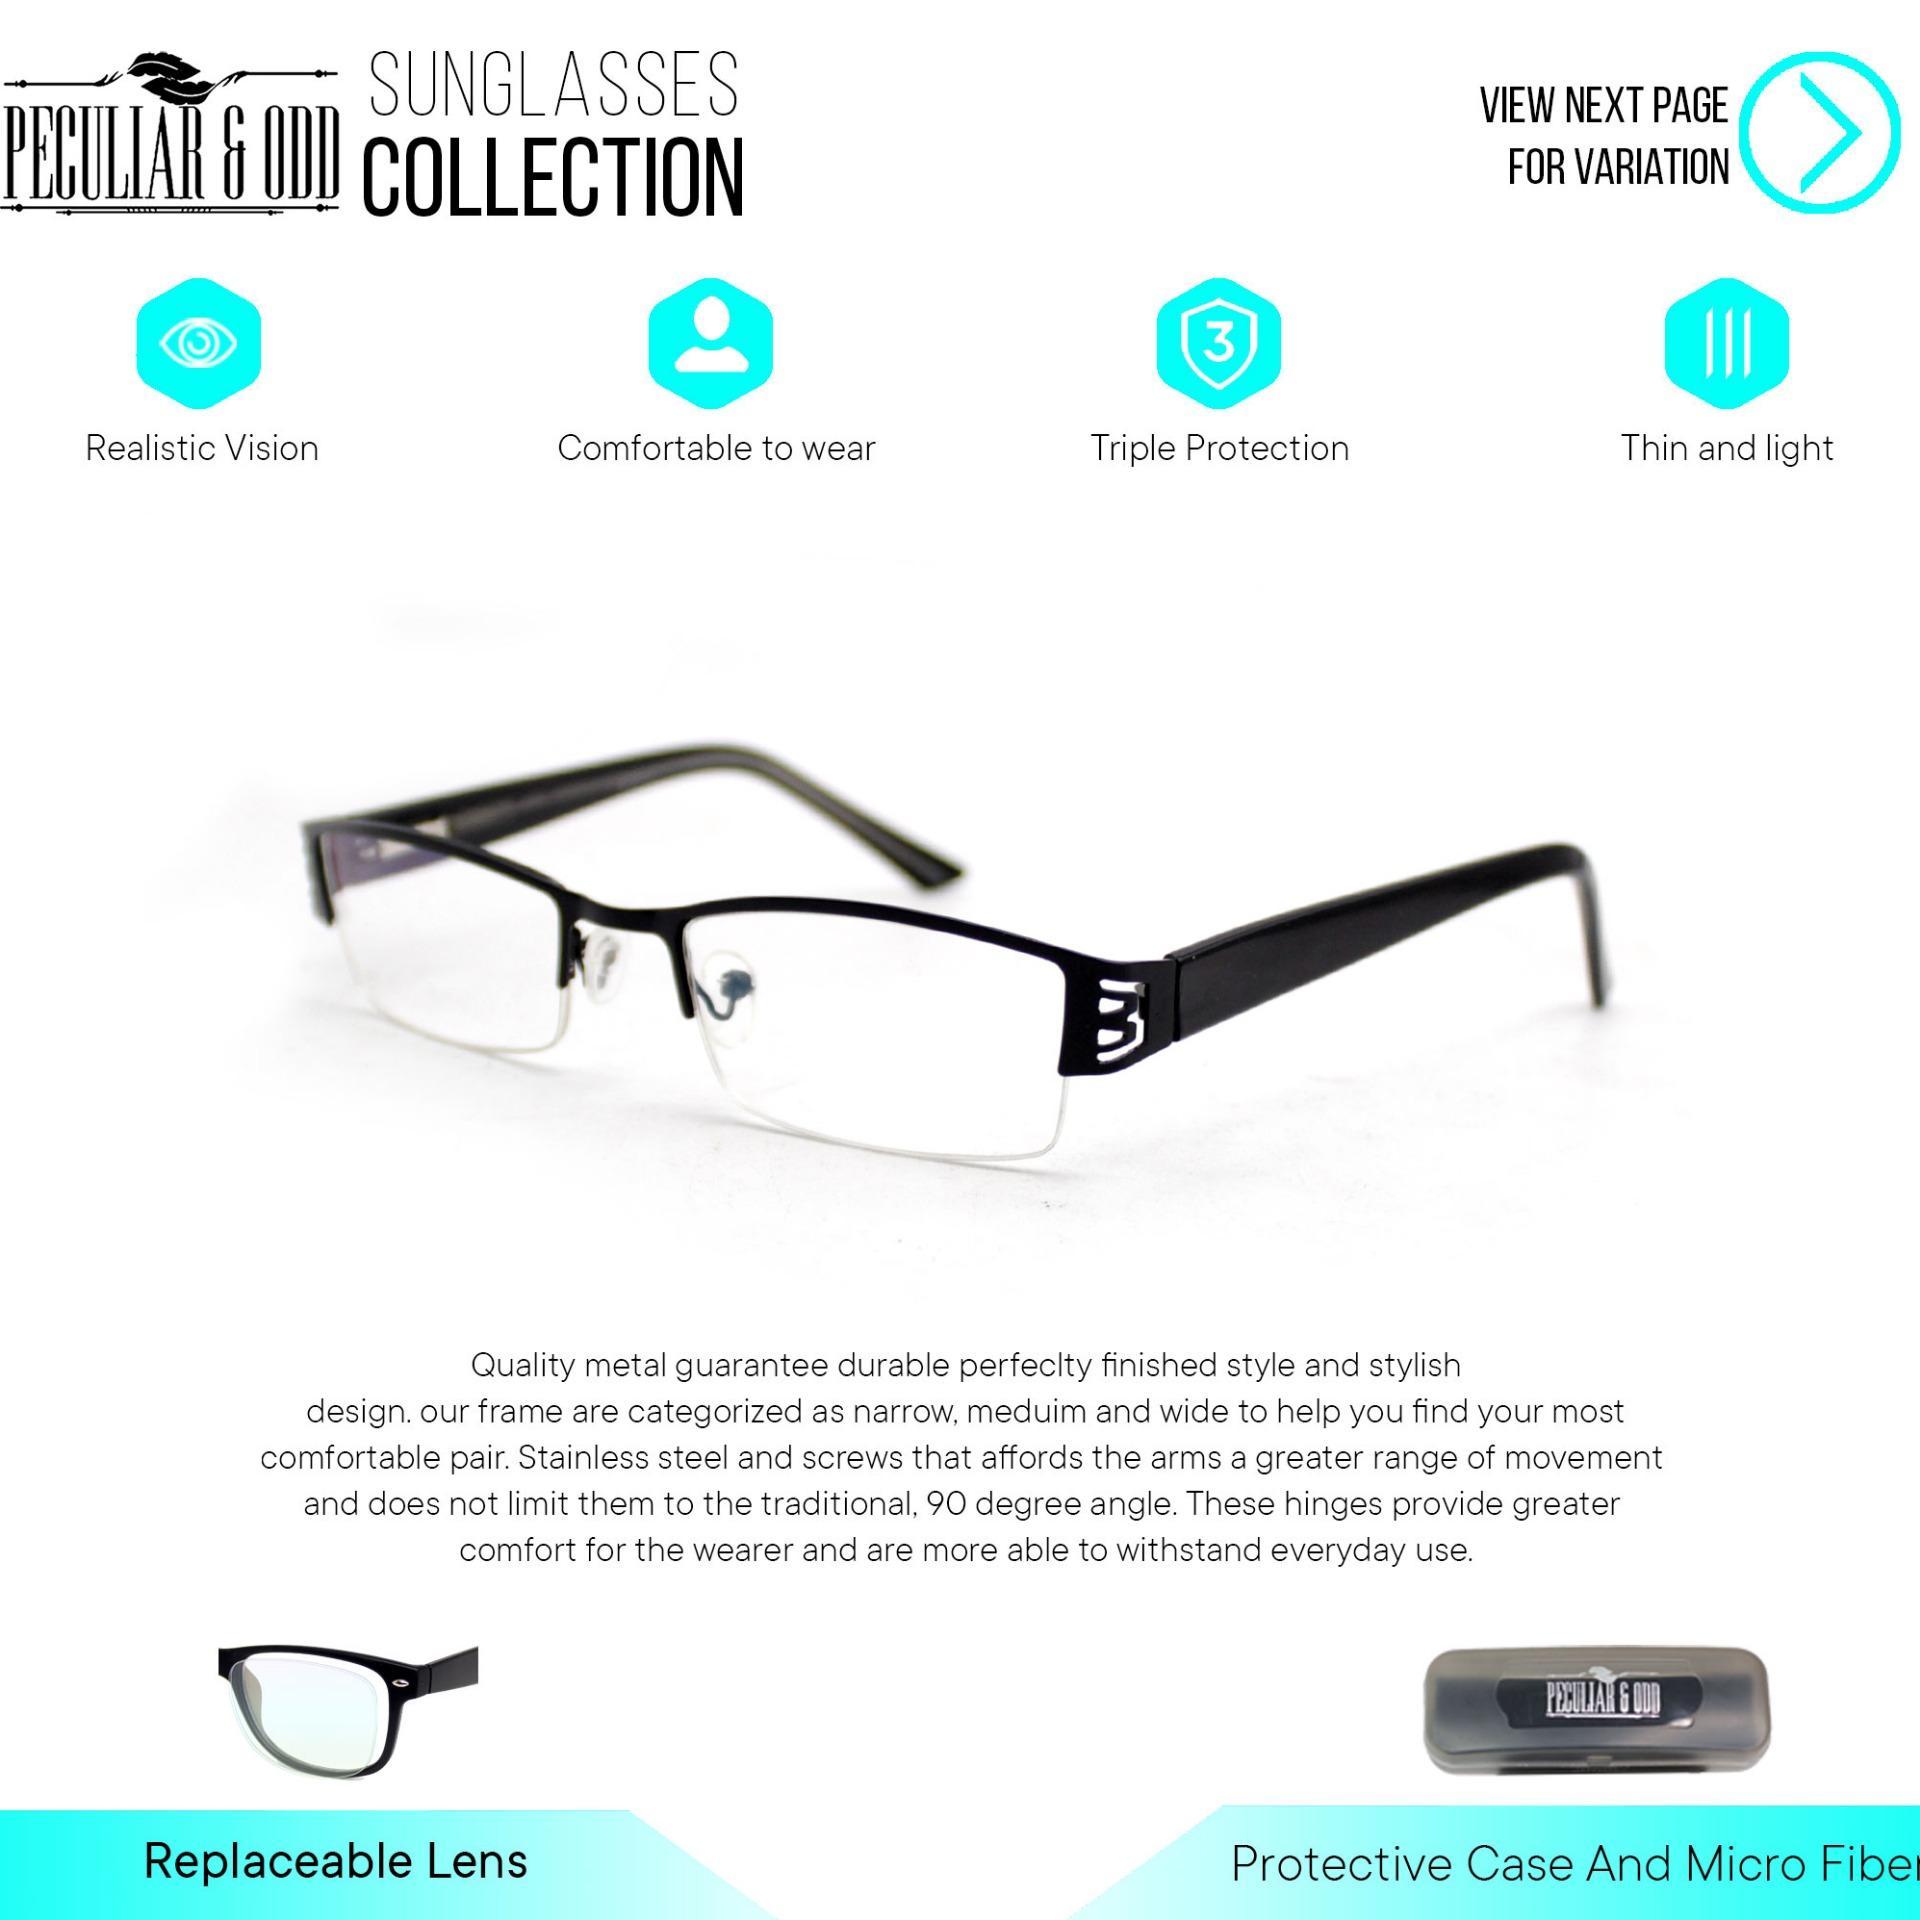 7035a3dc7 Peculiar Square 011 Half Rim Frame Replaceable for Prescription Lens Eyewear  / Eyeglass- Peculiar and